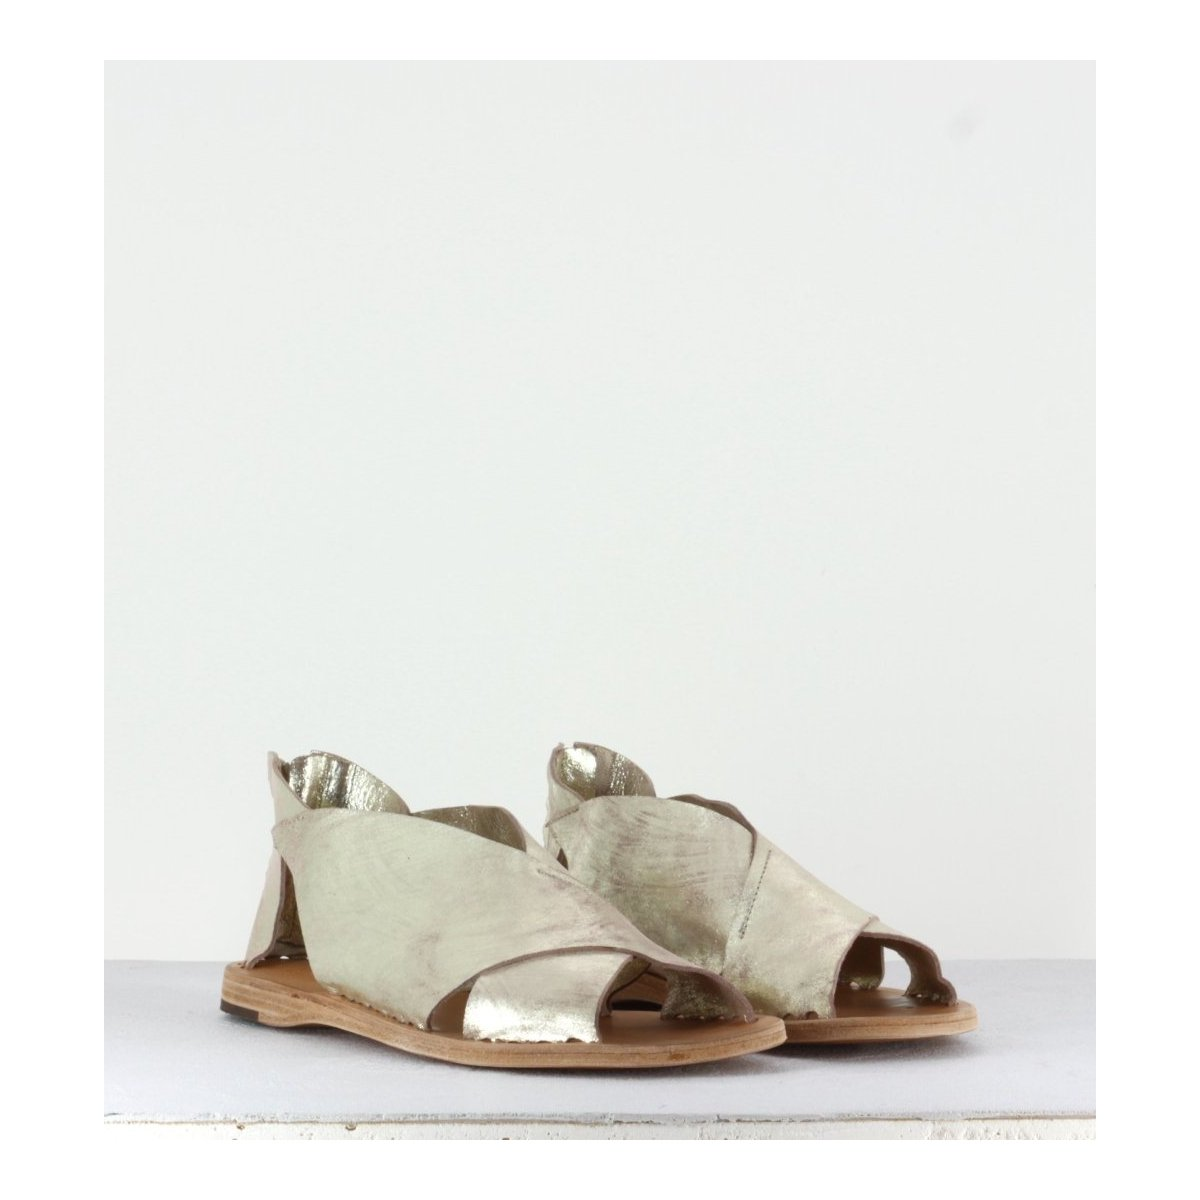 Sandales plates dorées - Itaca 026 Platino